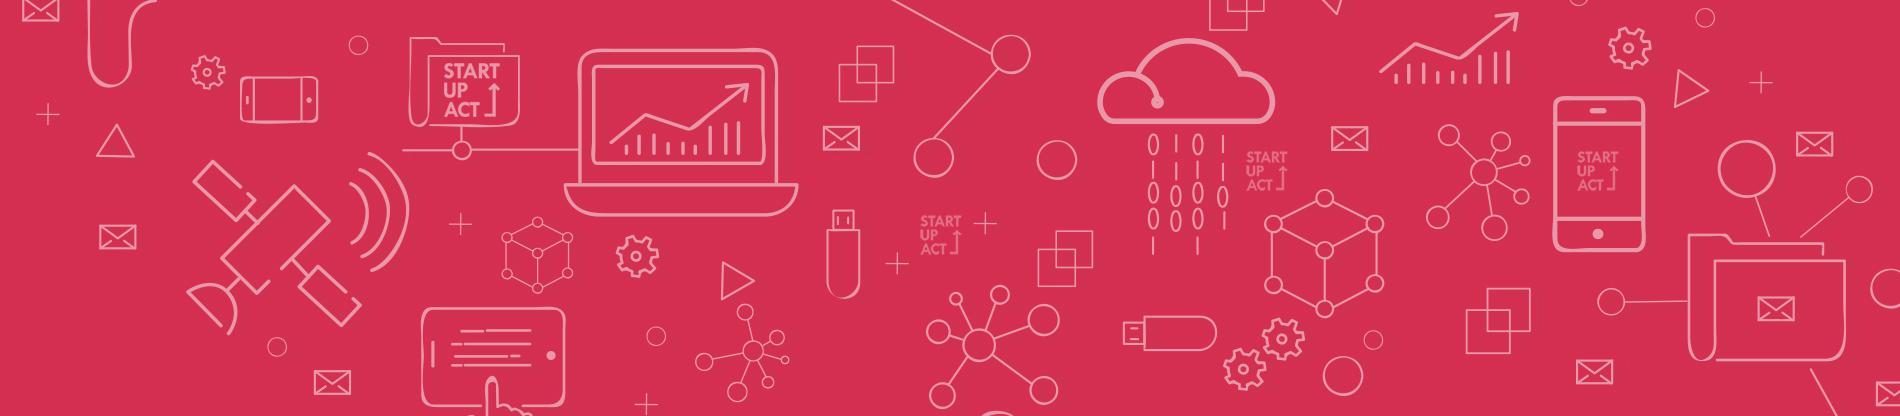 Annuaire agrégation actualite Startups Tunisie